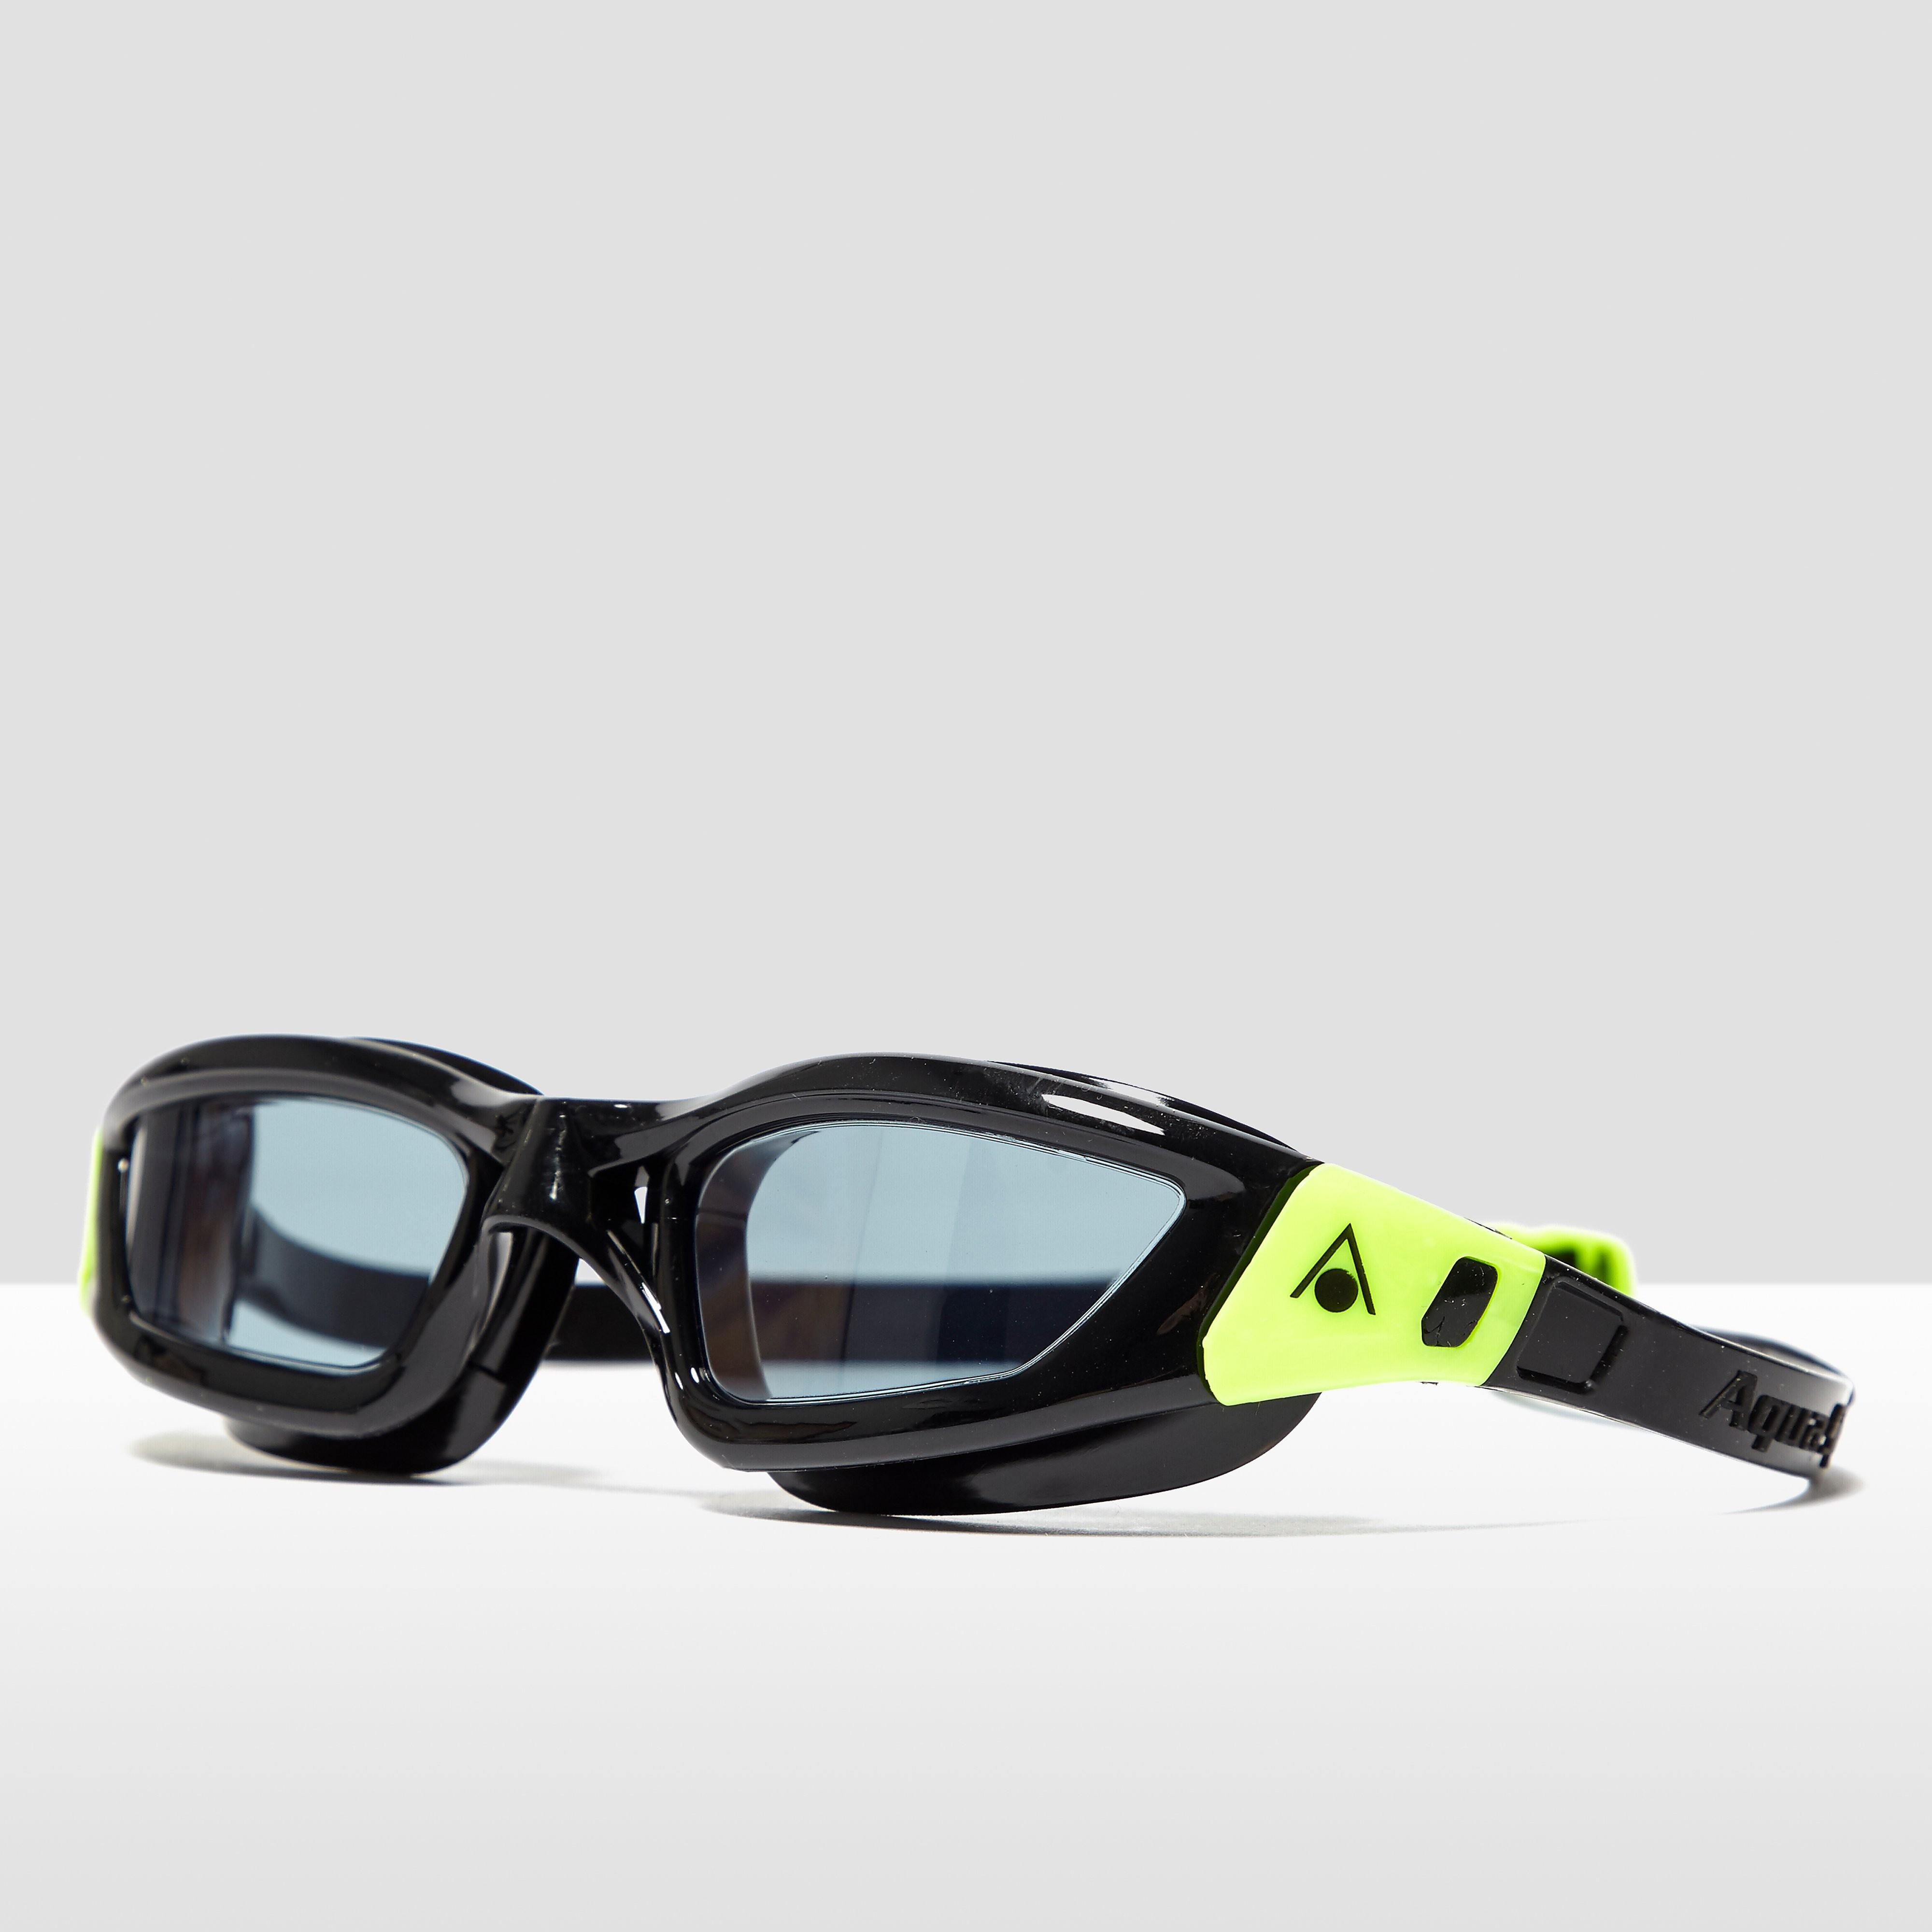 Aqua Sphere Kameleon Adult Swimming Goggles